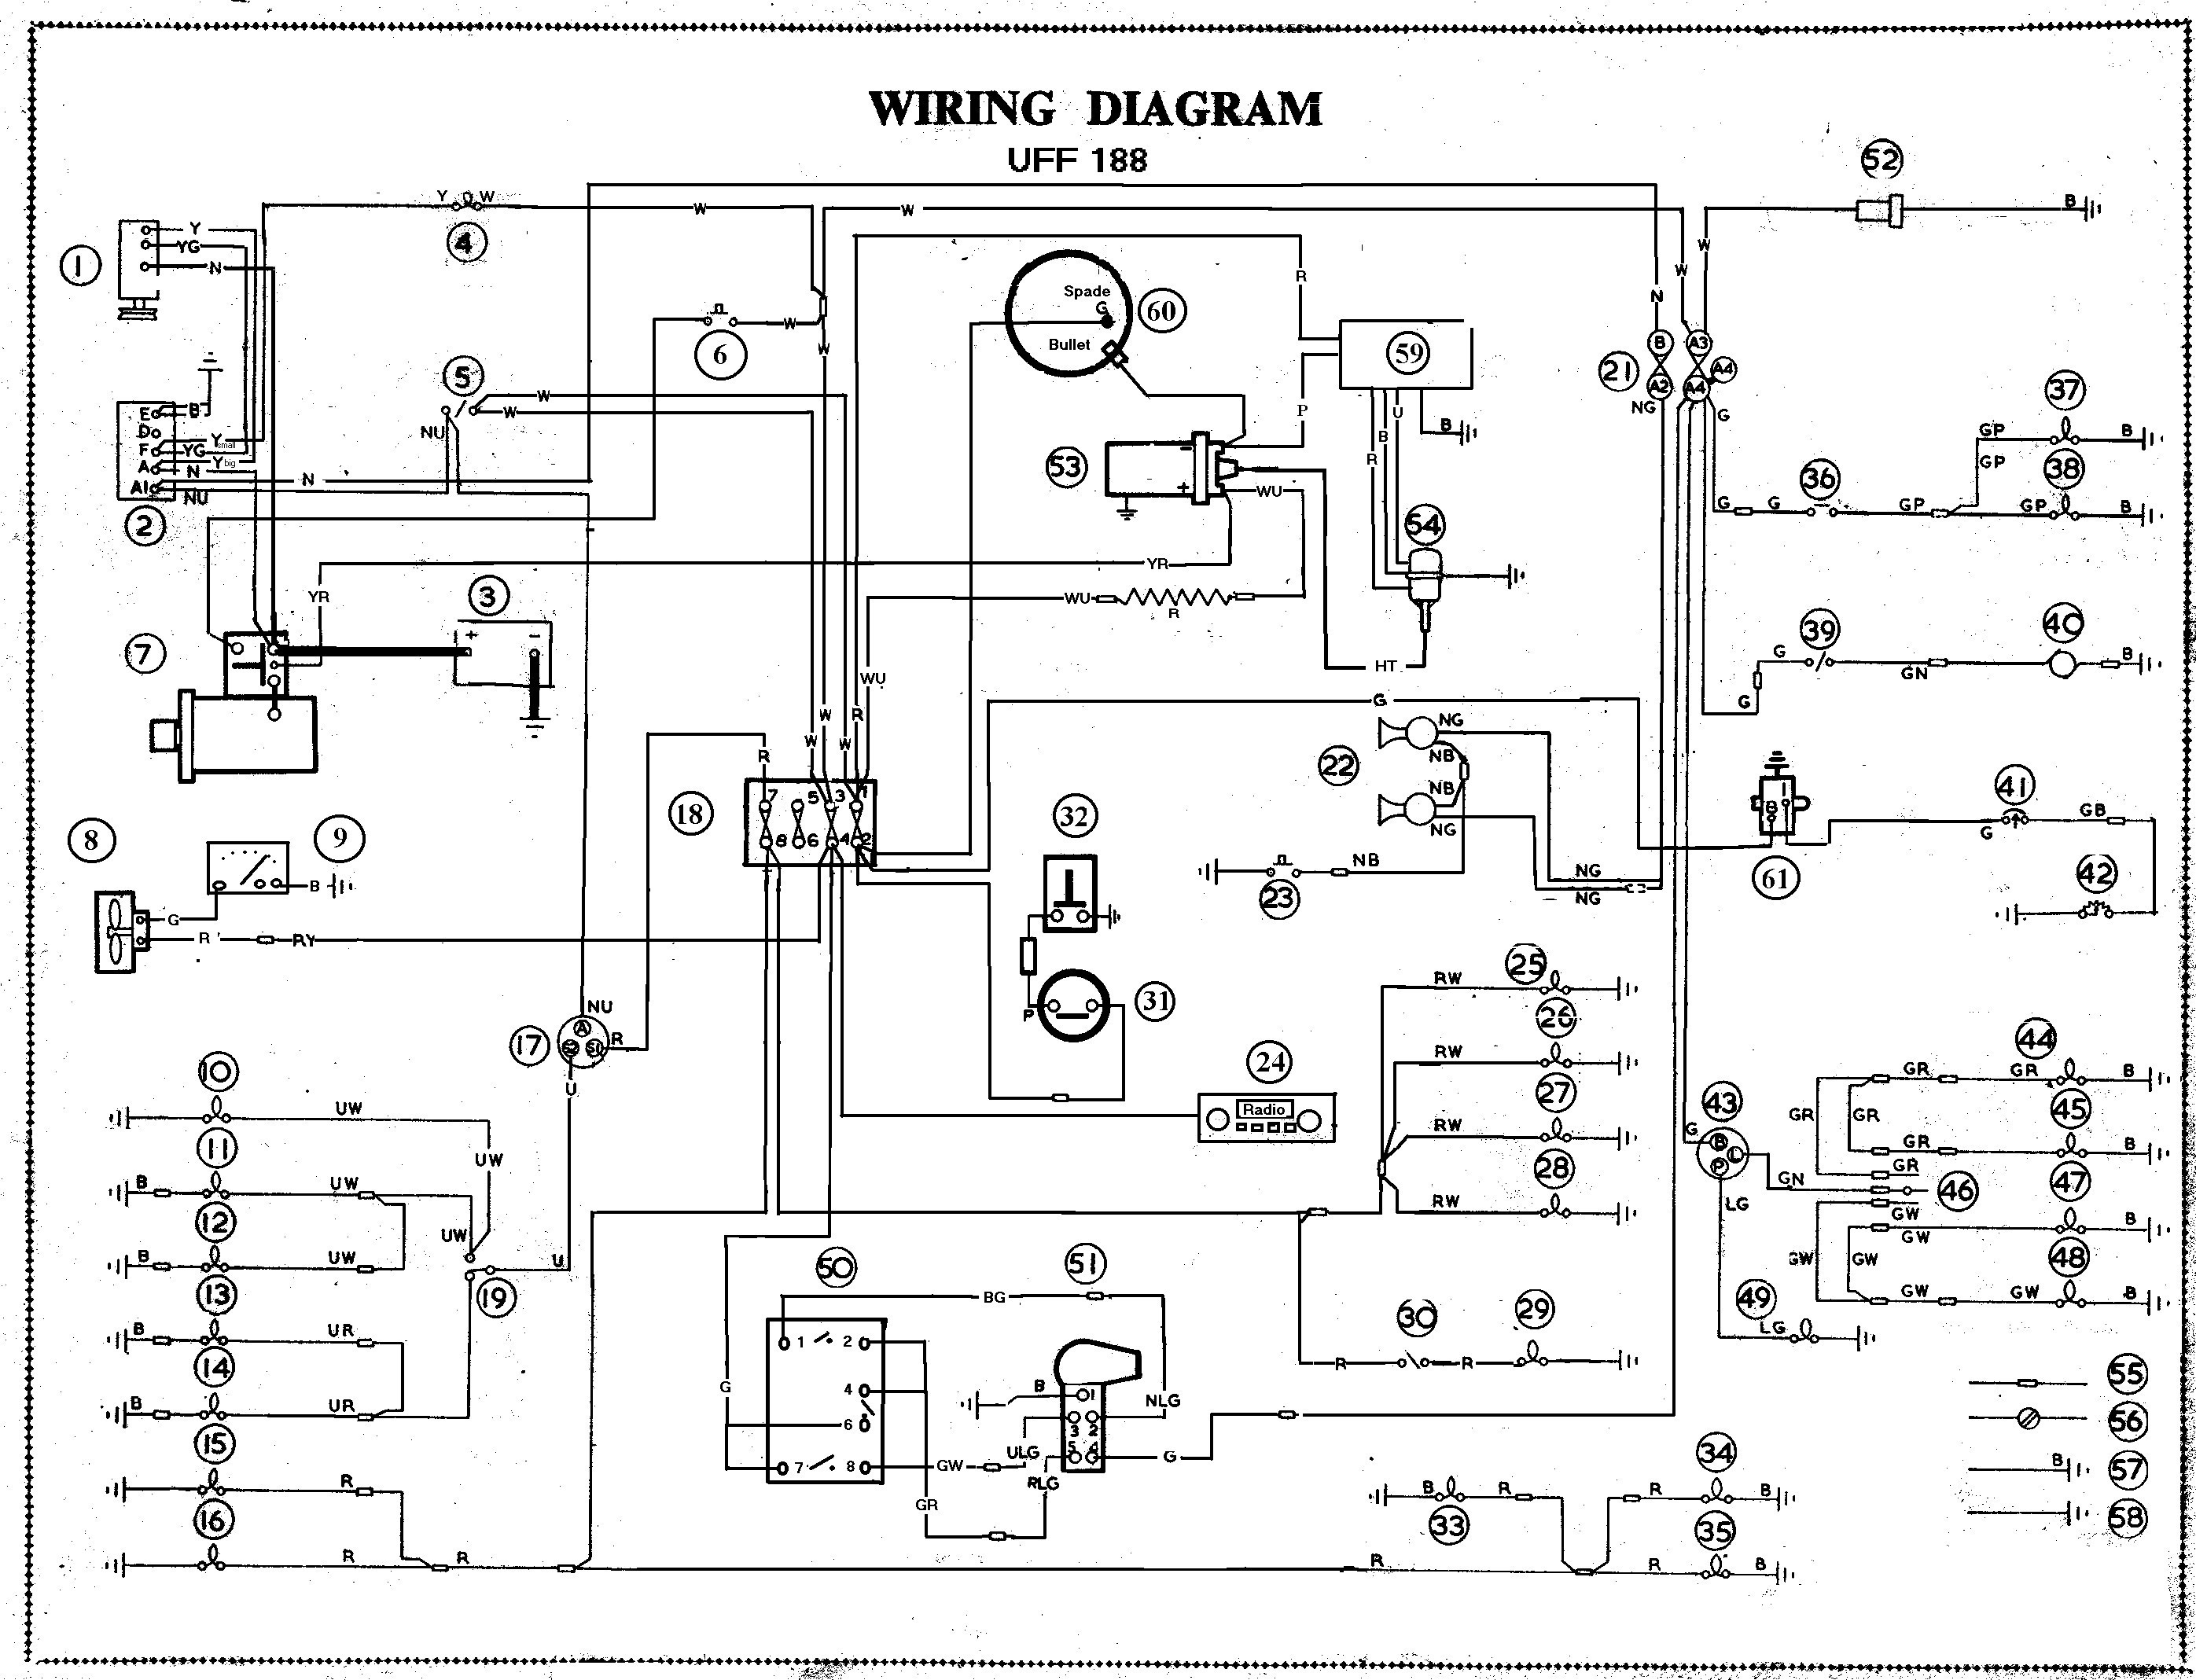 Zivan Diagram Gem Car Wiring - Wiring Diagram Data - 48 Volt Battery Wiring Diagram